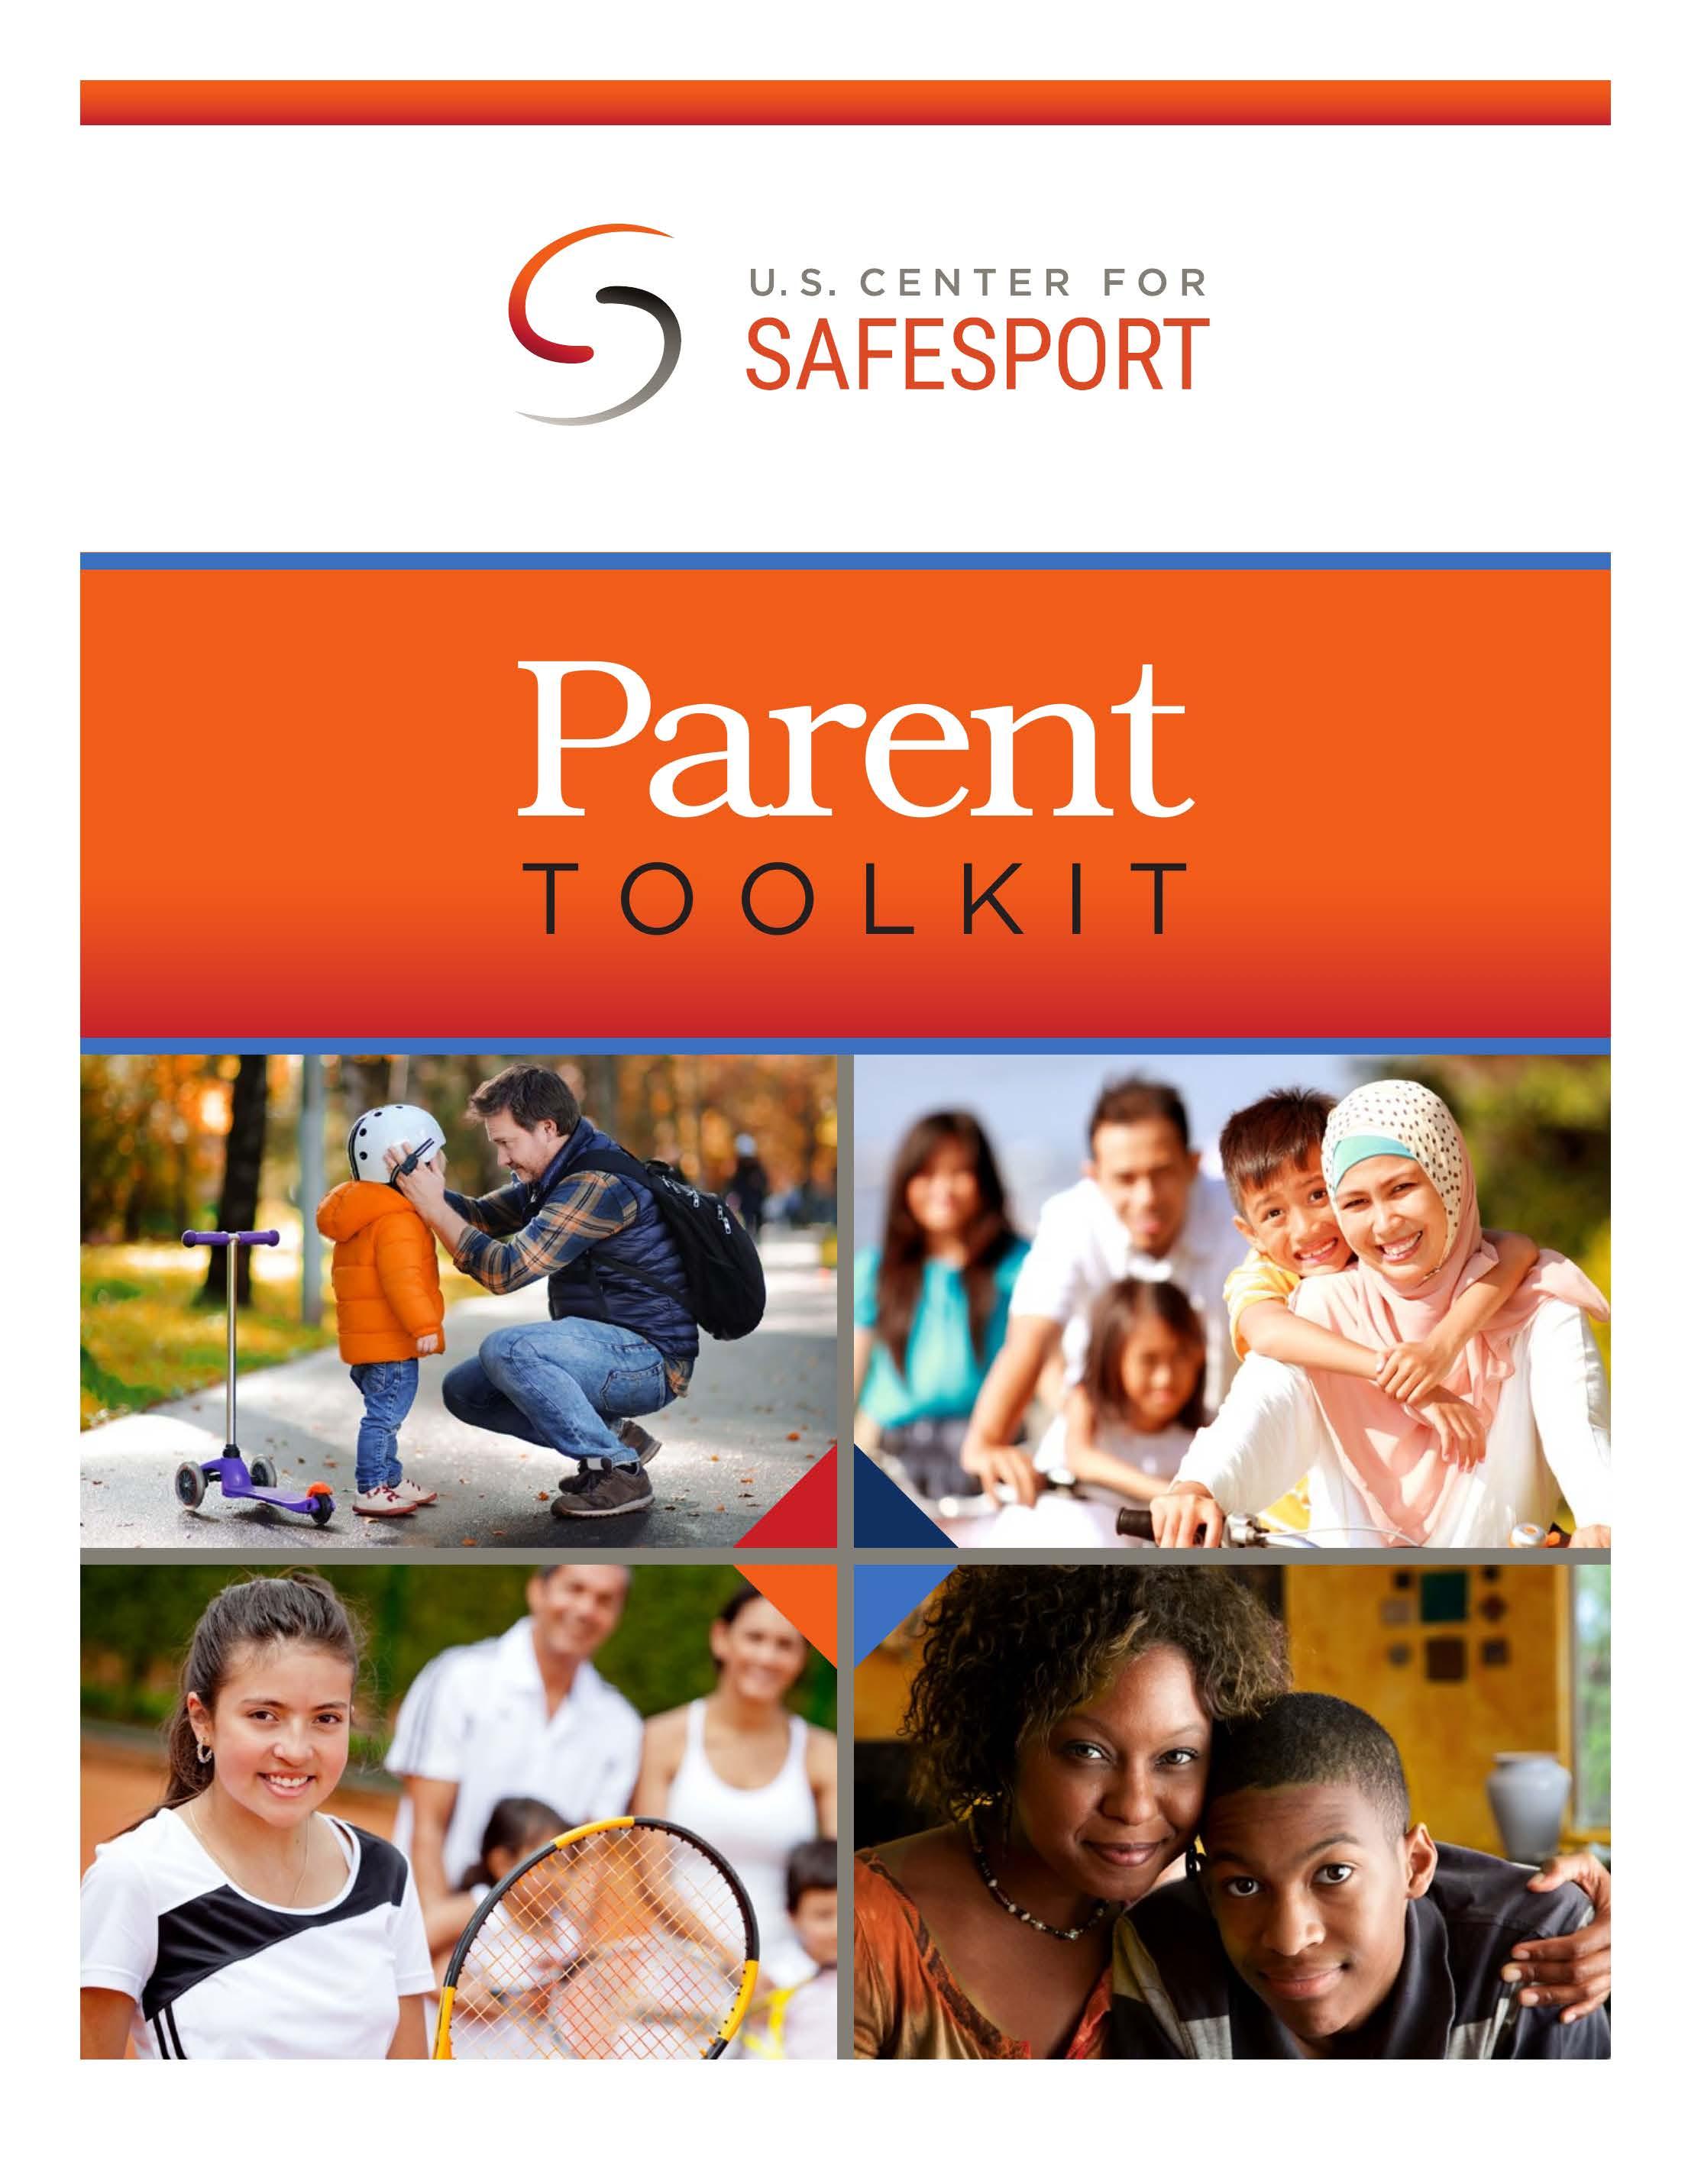 Parent Safe Sport Kit